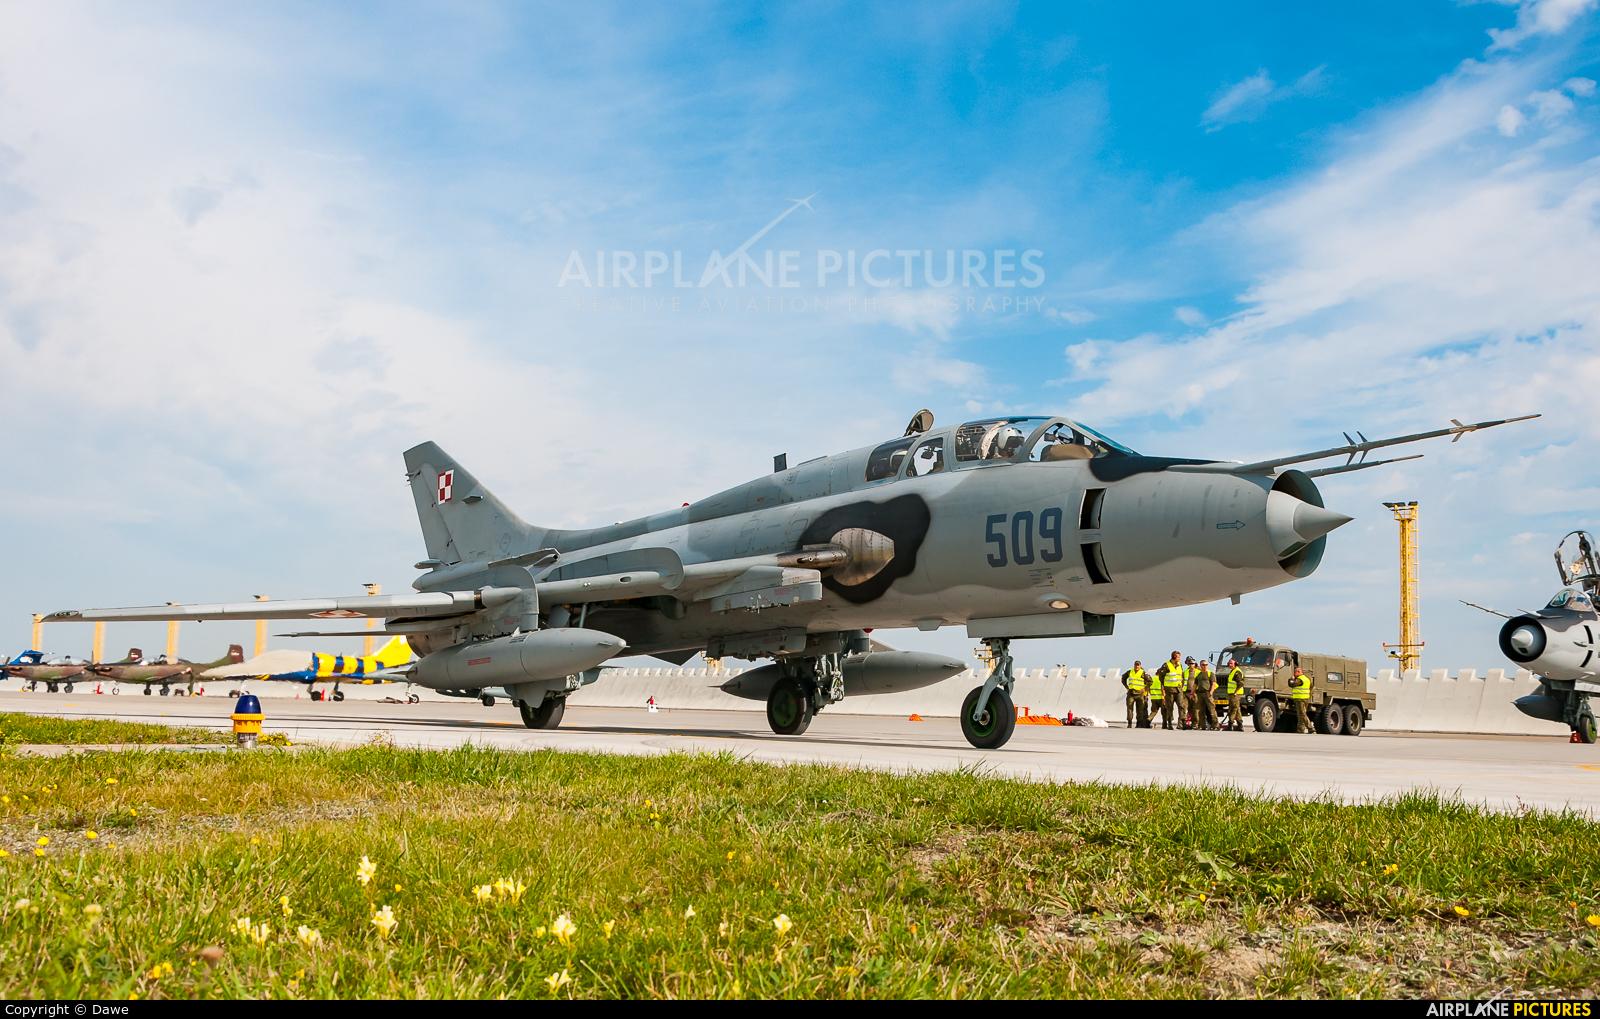 Poland - Air Force 509 aircraft at Náměšť nad Oslavou